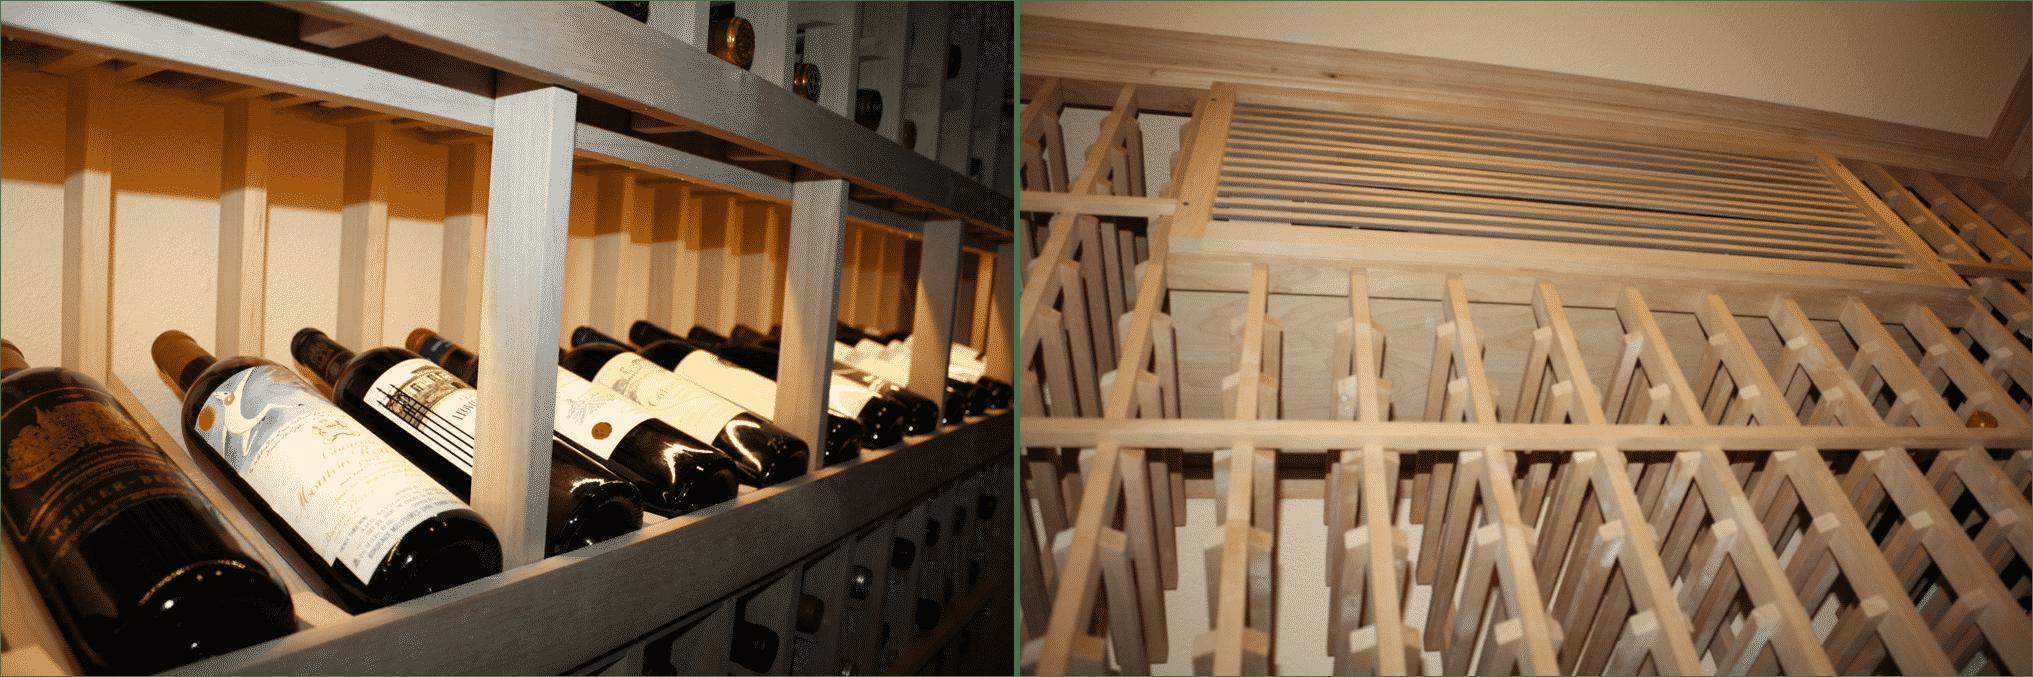 Texas Wine Cellar Built In A Small Storage Closet